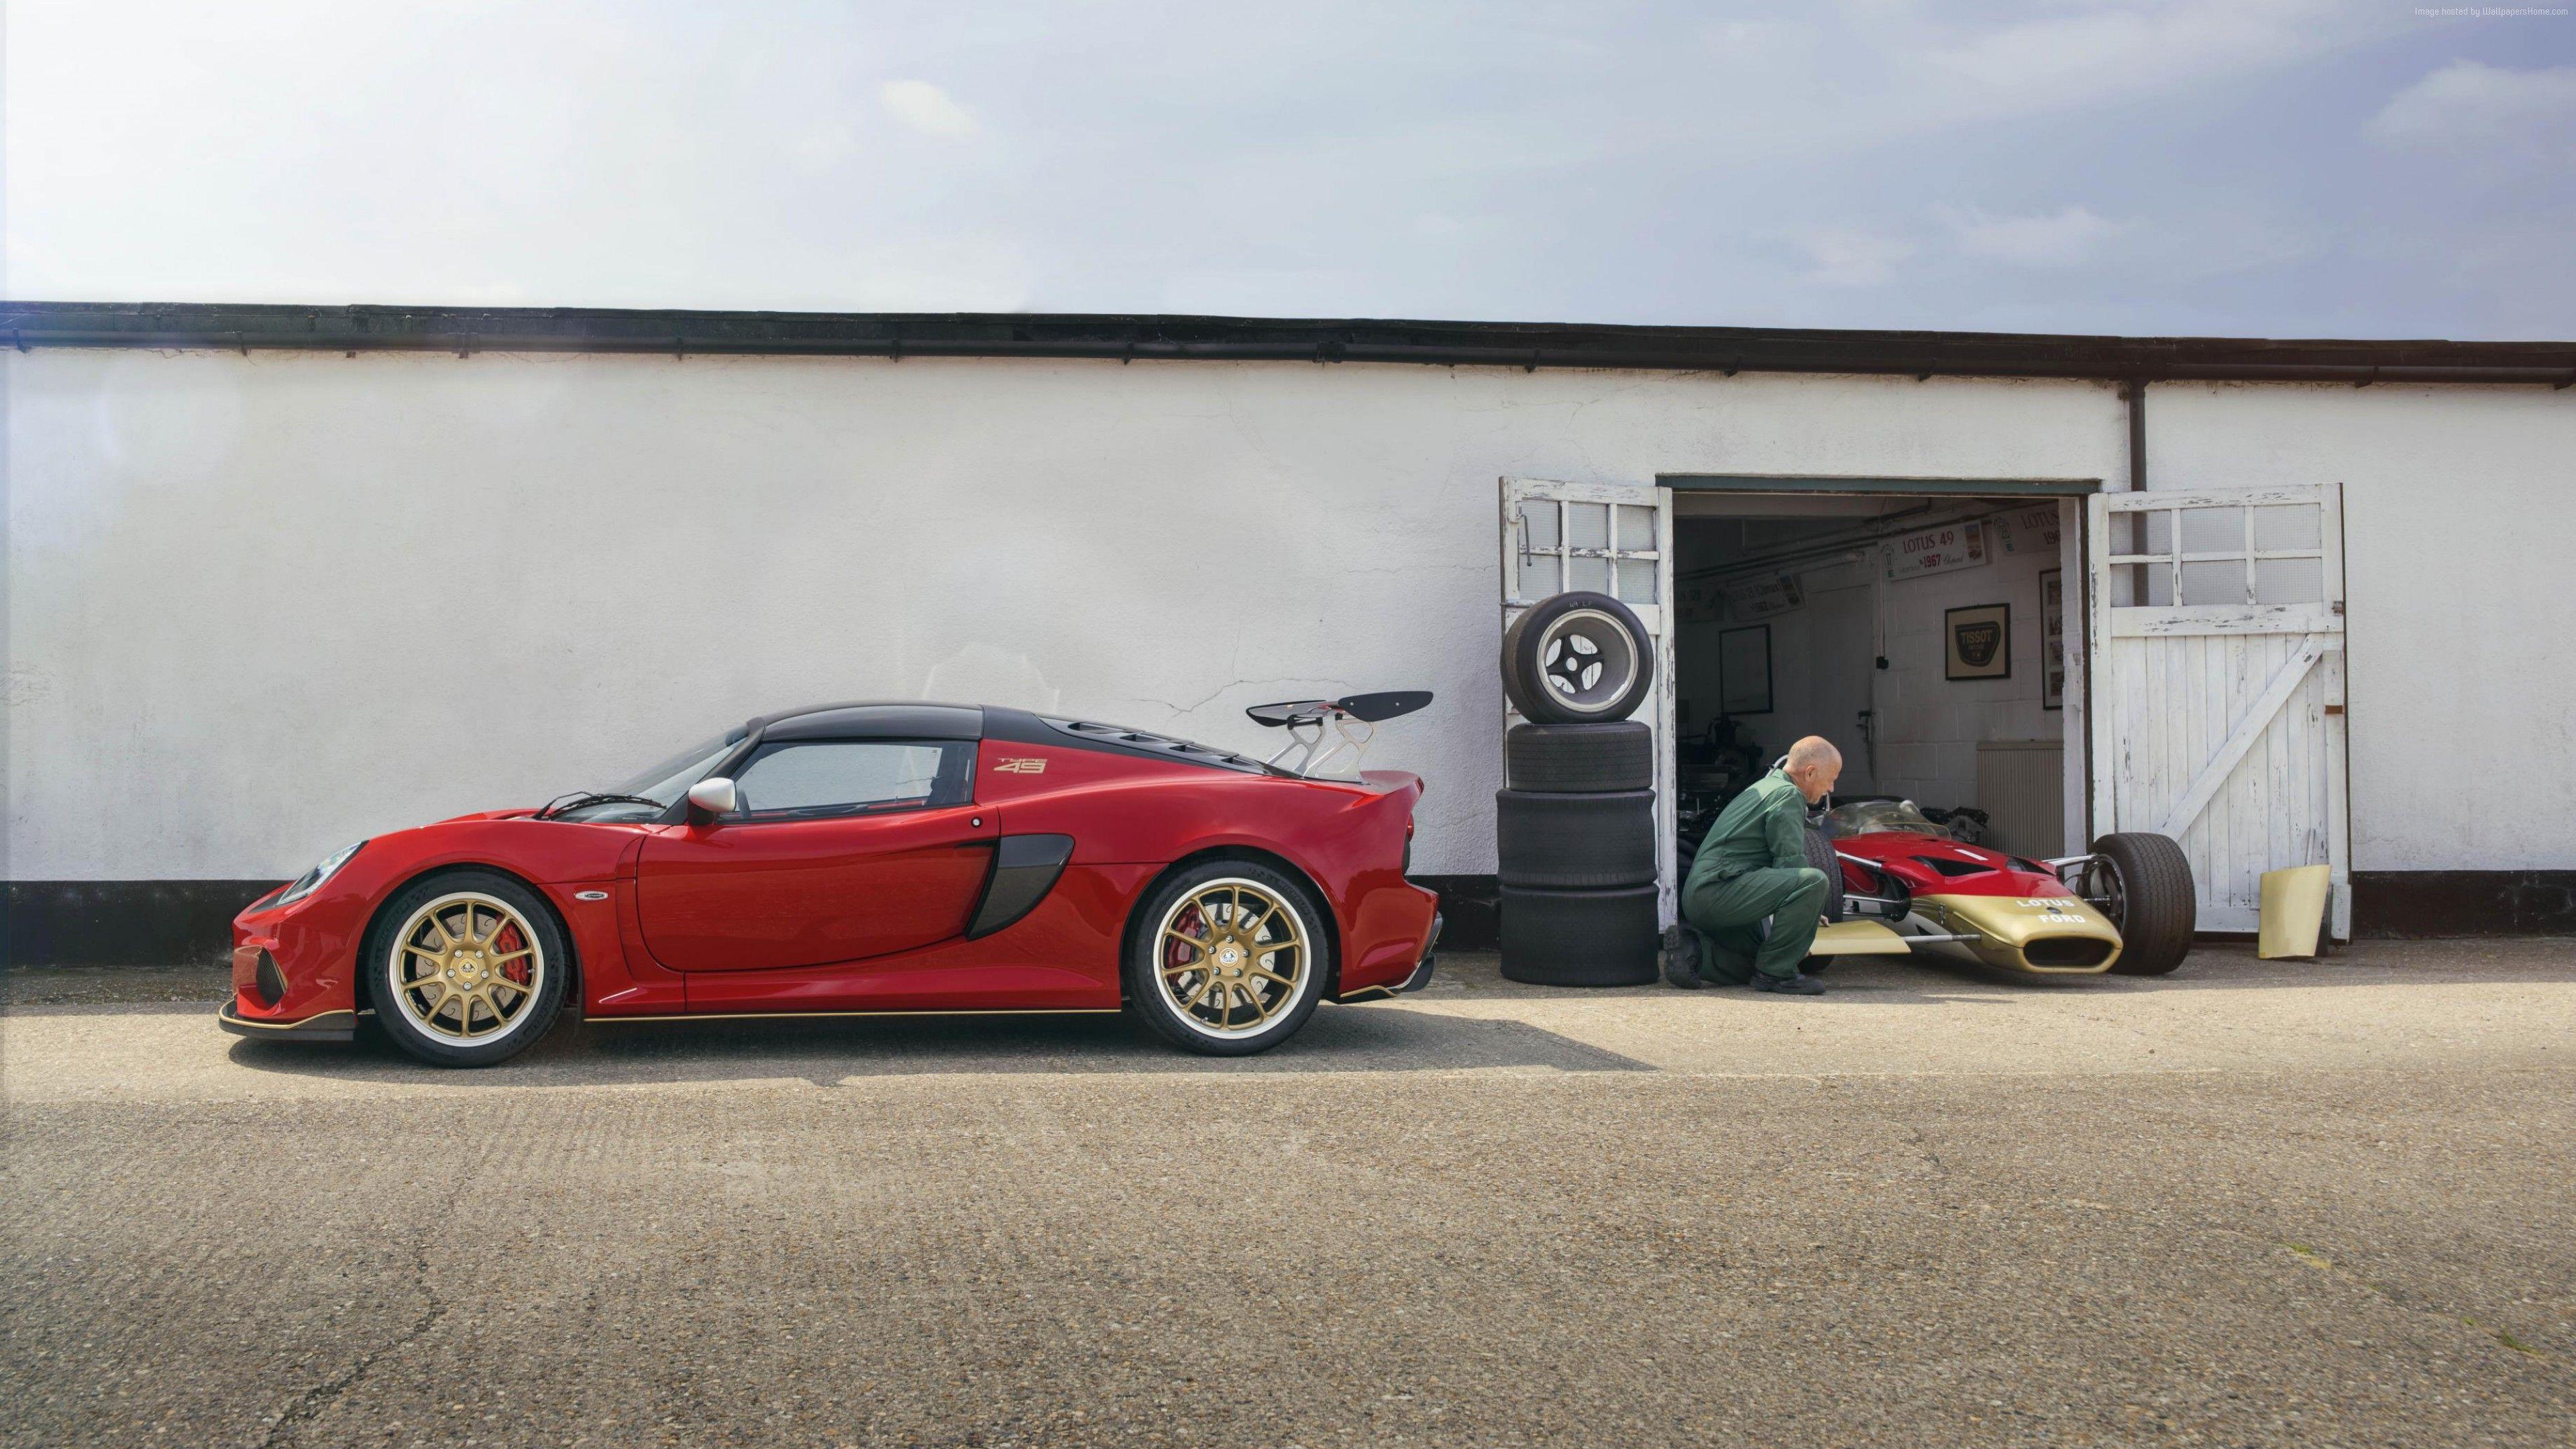 Wallpaper Lotus Exige Gt Type 49 2018 Cars Supercar 4k Cars